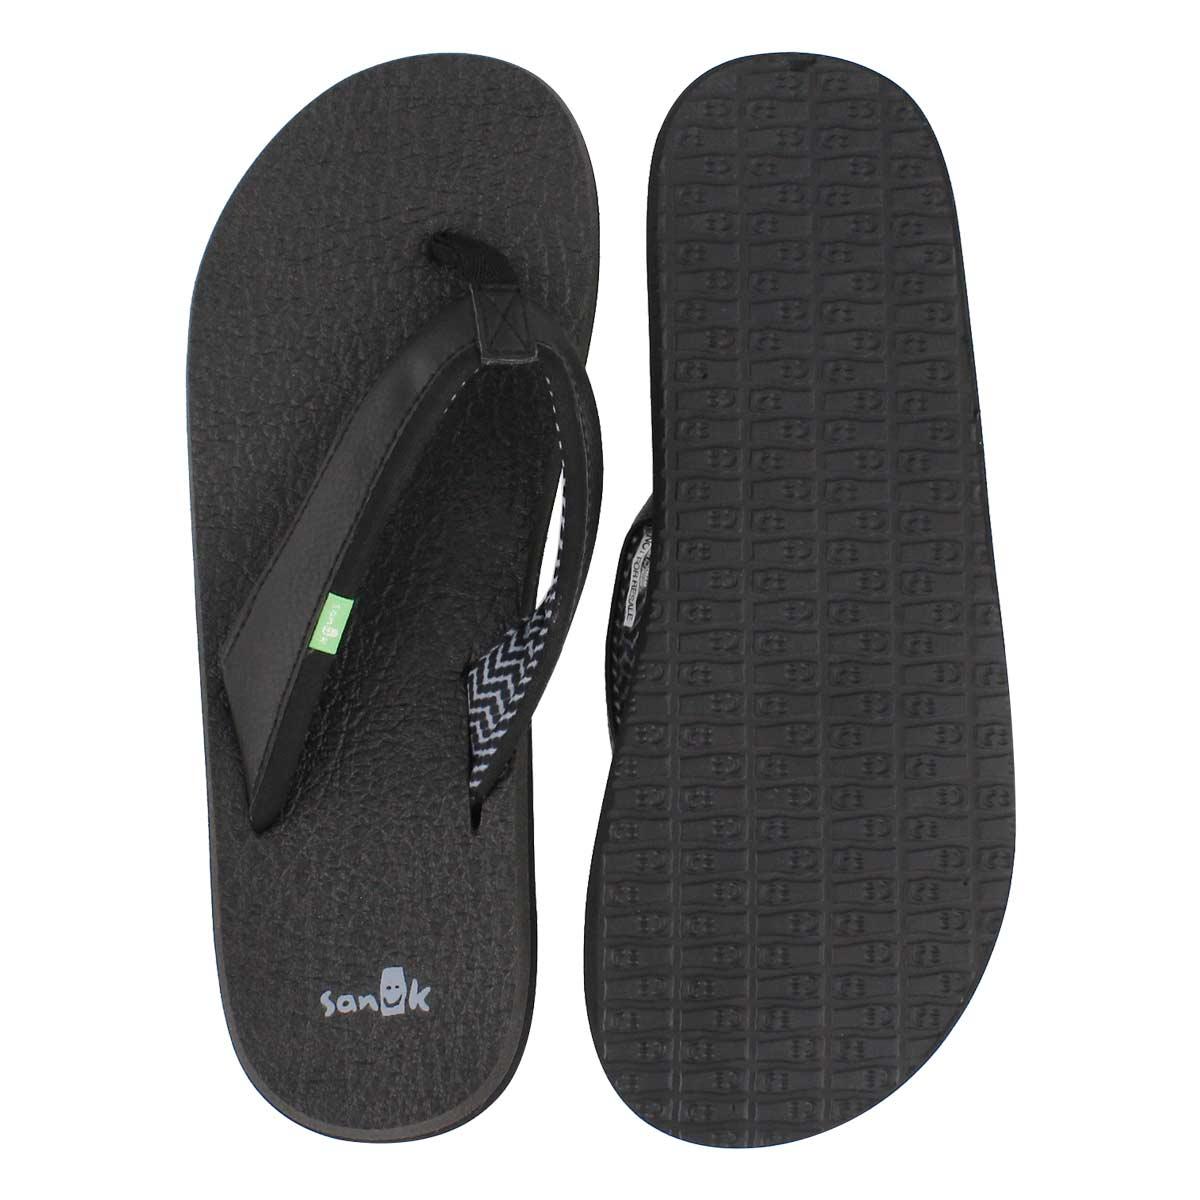 Sandale tong Yoga Mat 2, noir, femme